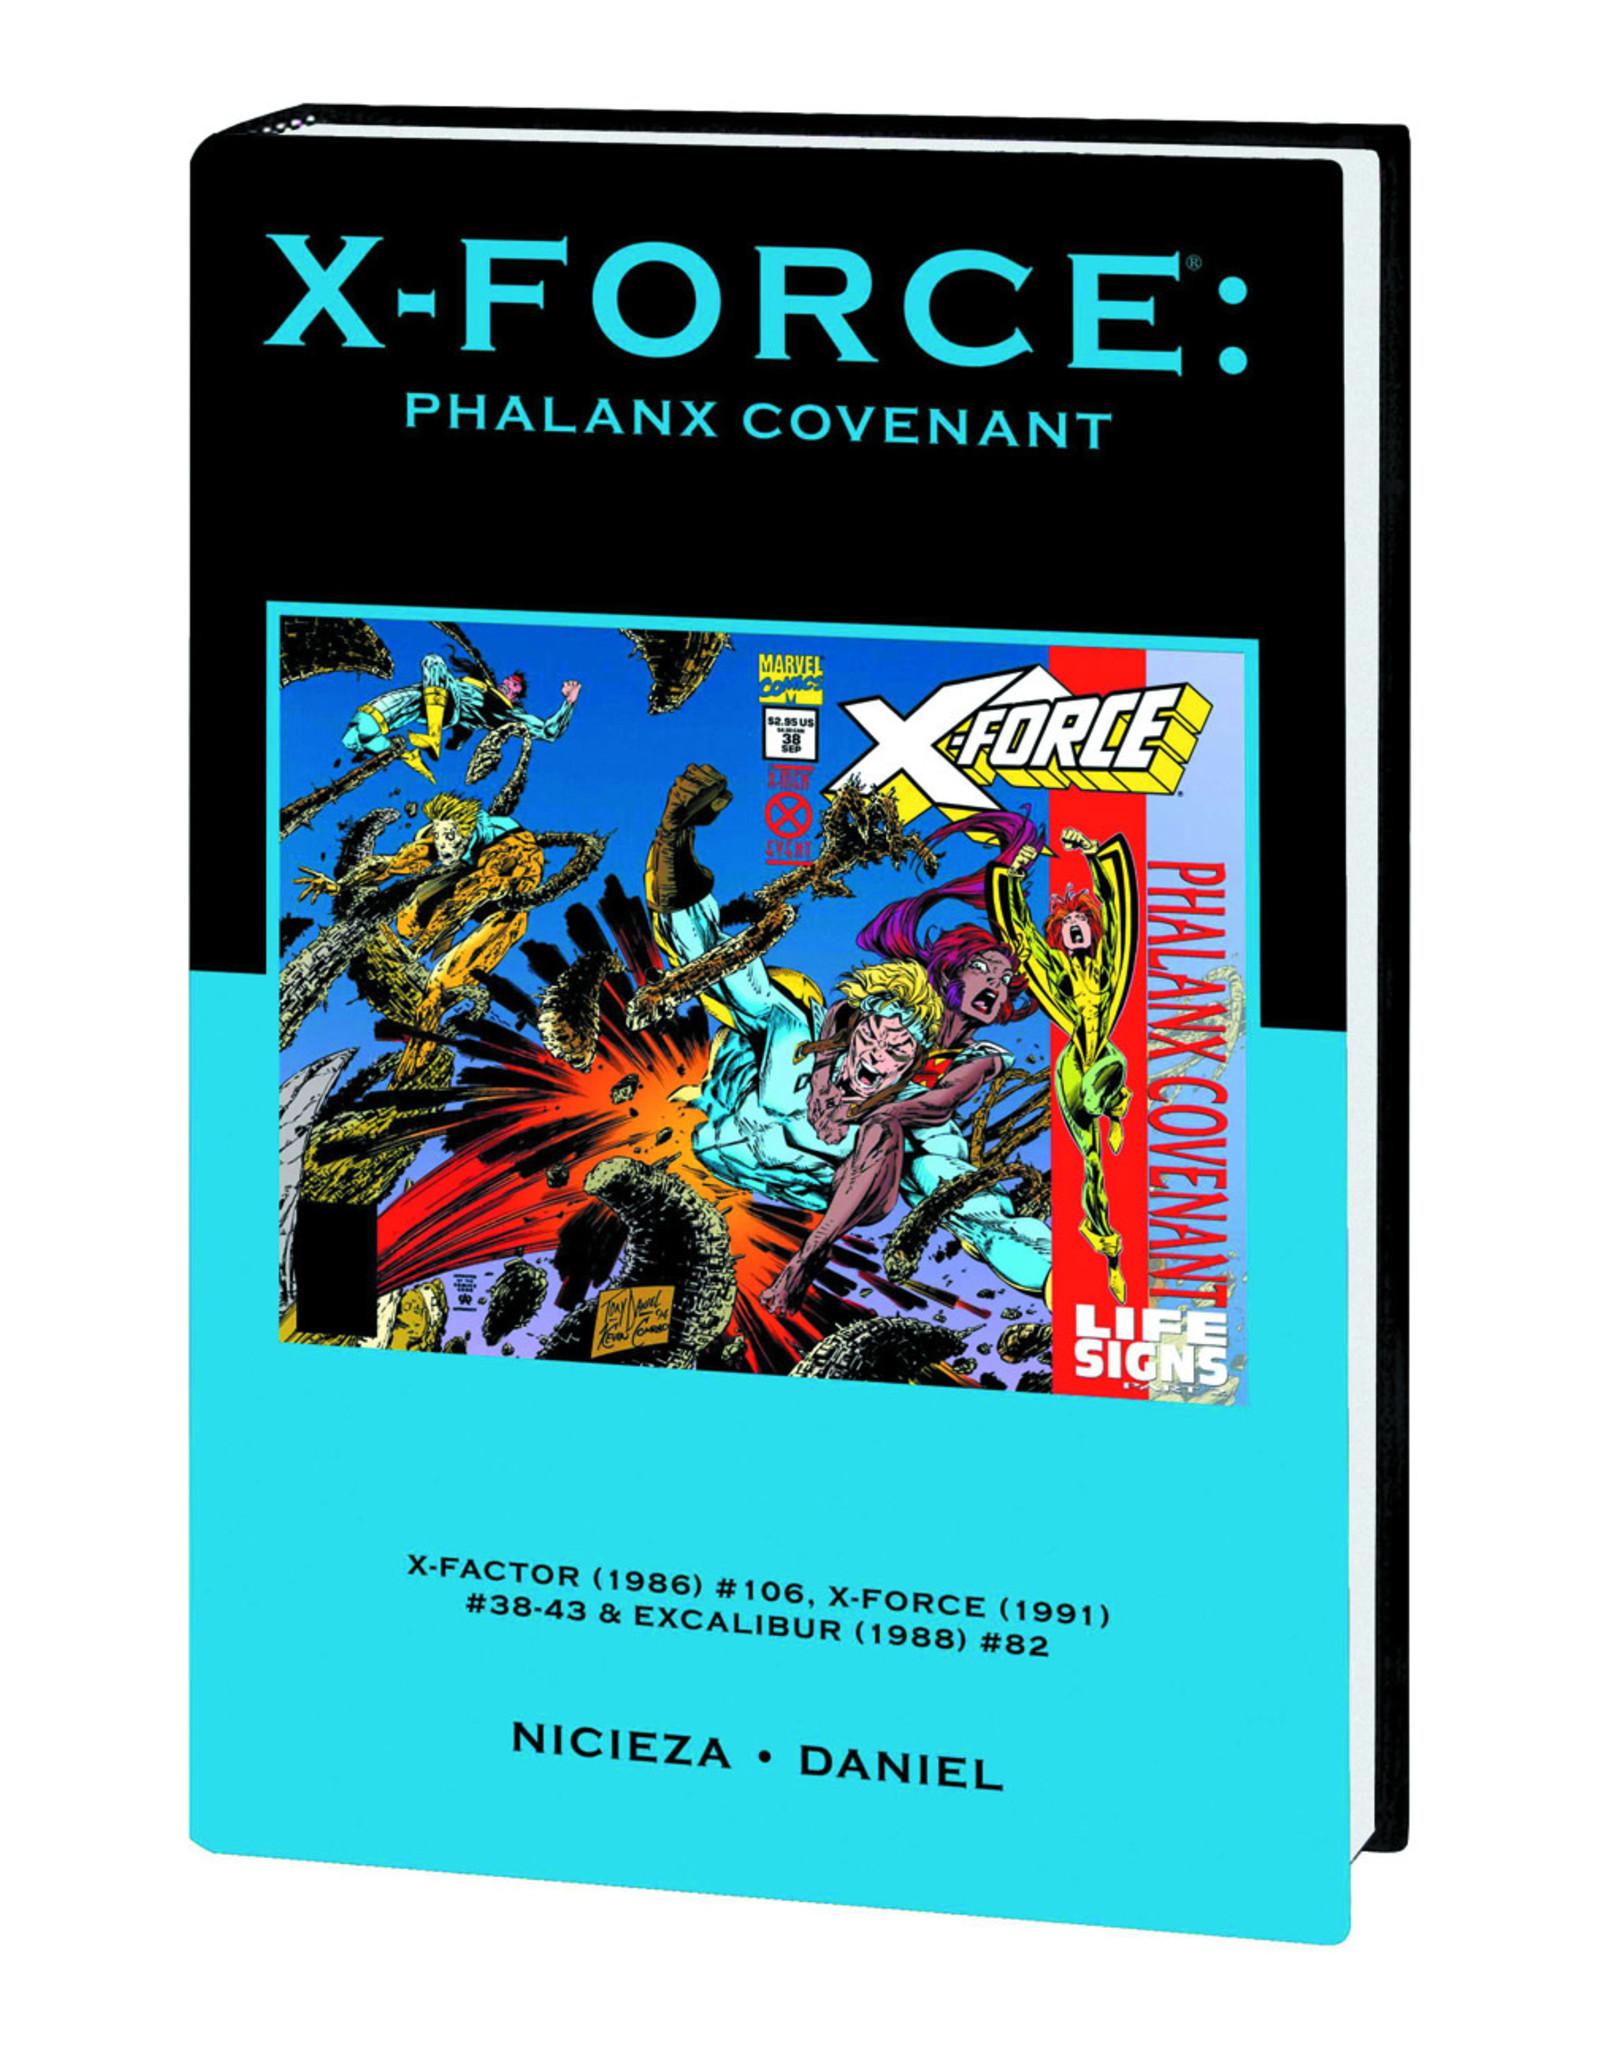 MARVEL COMICS X-FORCE PREM HC PHALANX COVENANT DM VAR ED 107